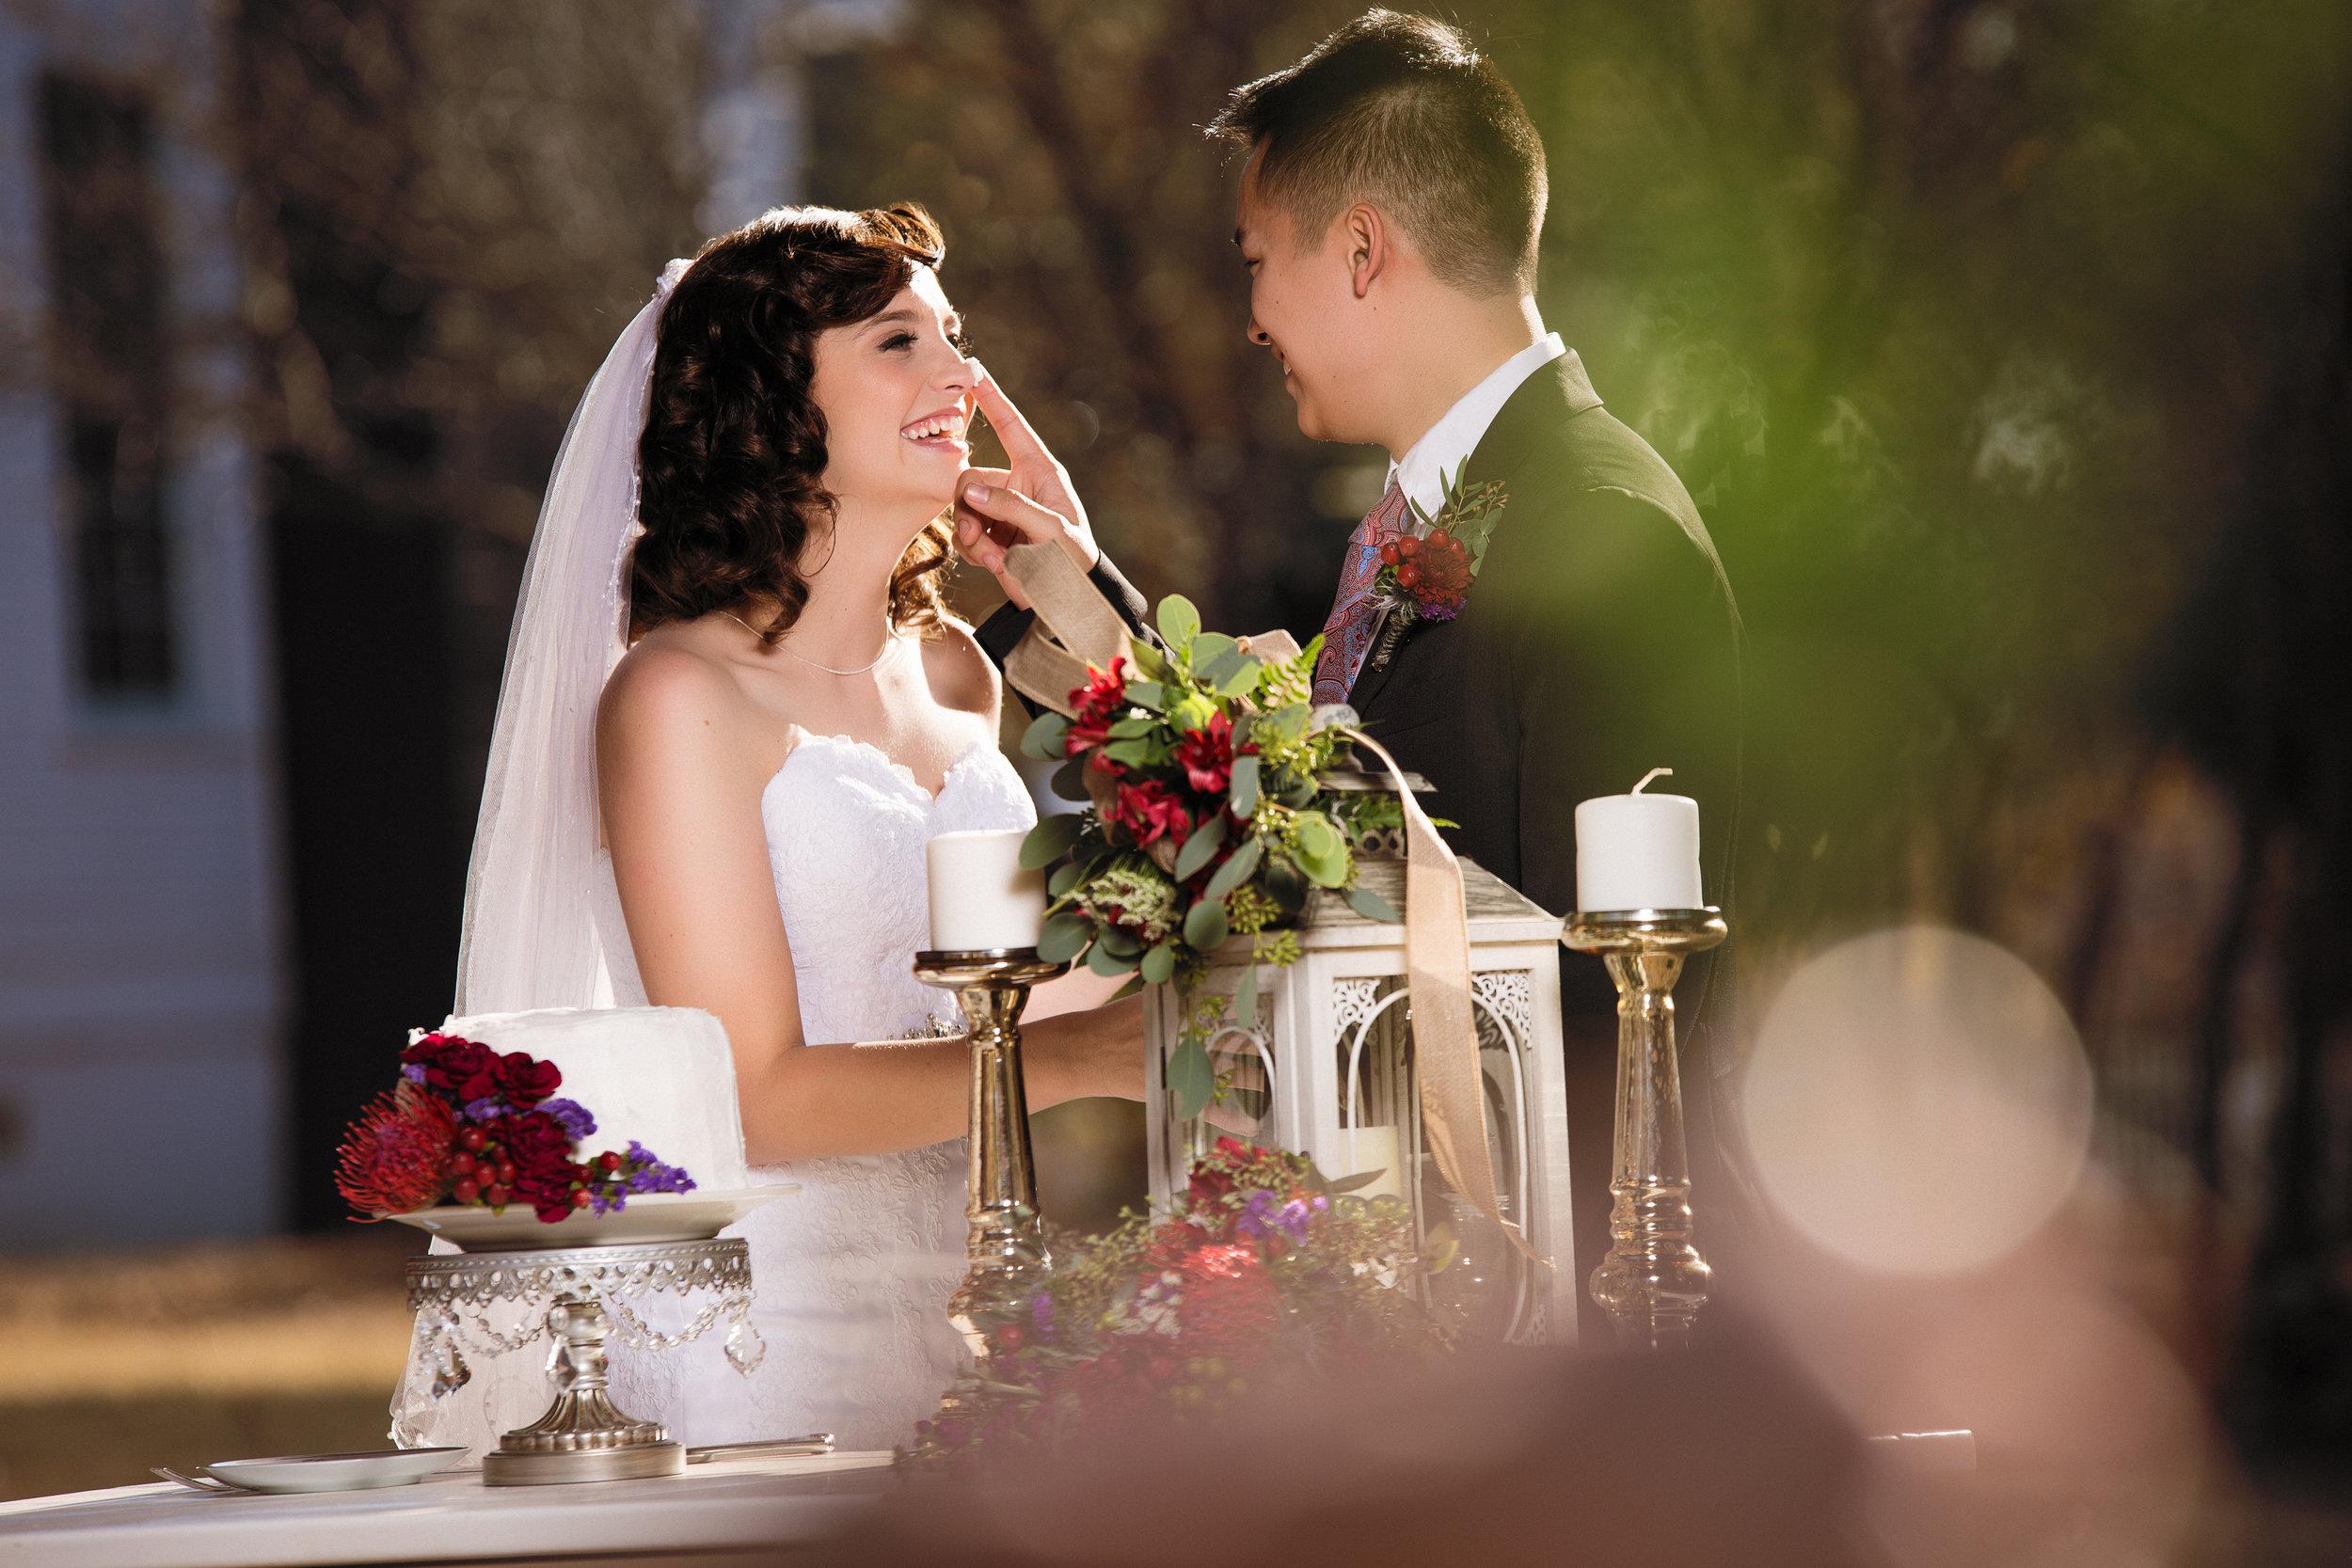 Pheauxtography_WeddingConcept-36.jpg